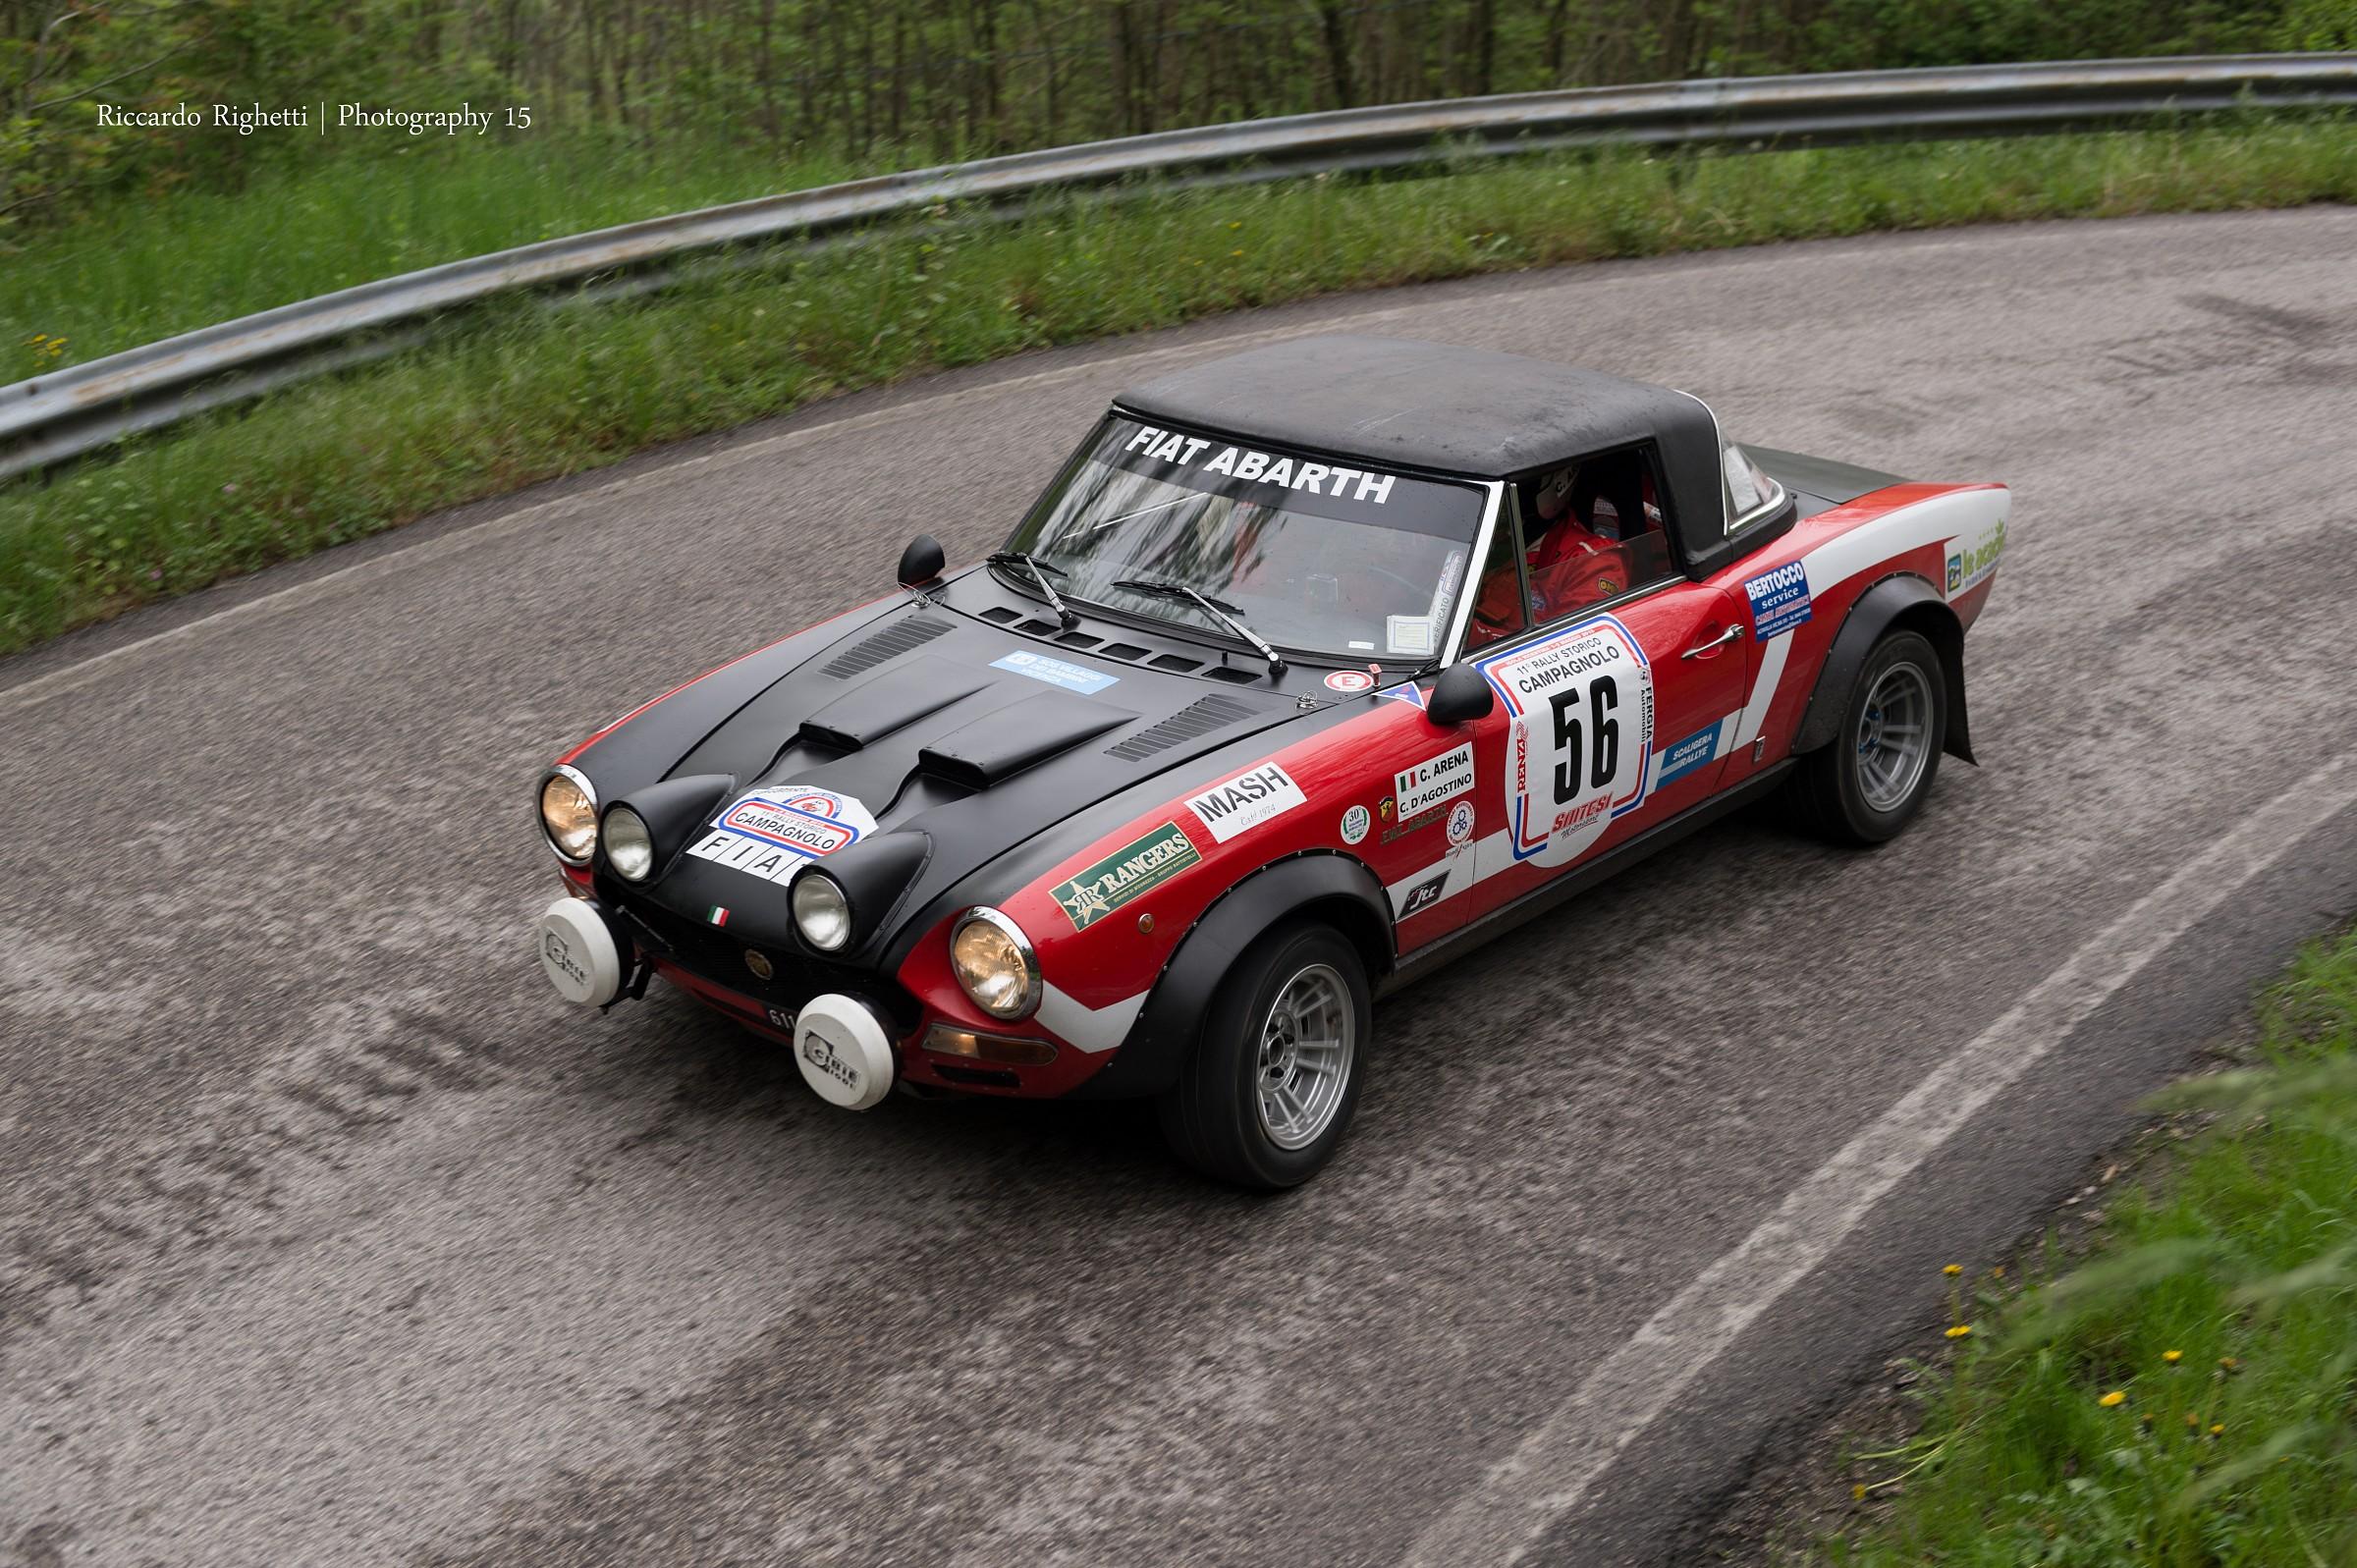 Fiat 124 Abarth_01...